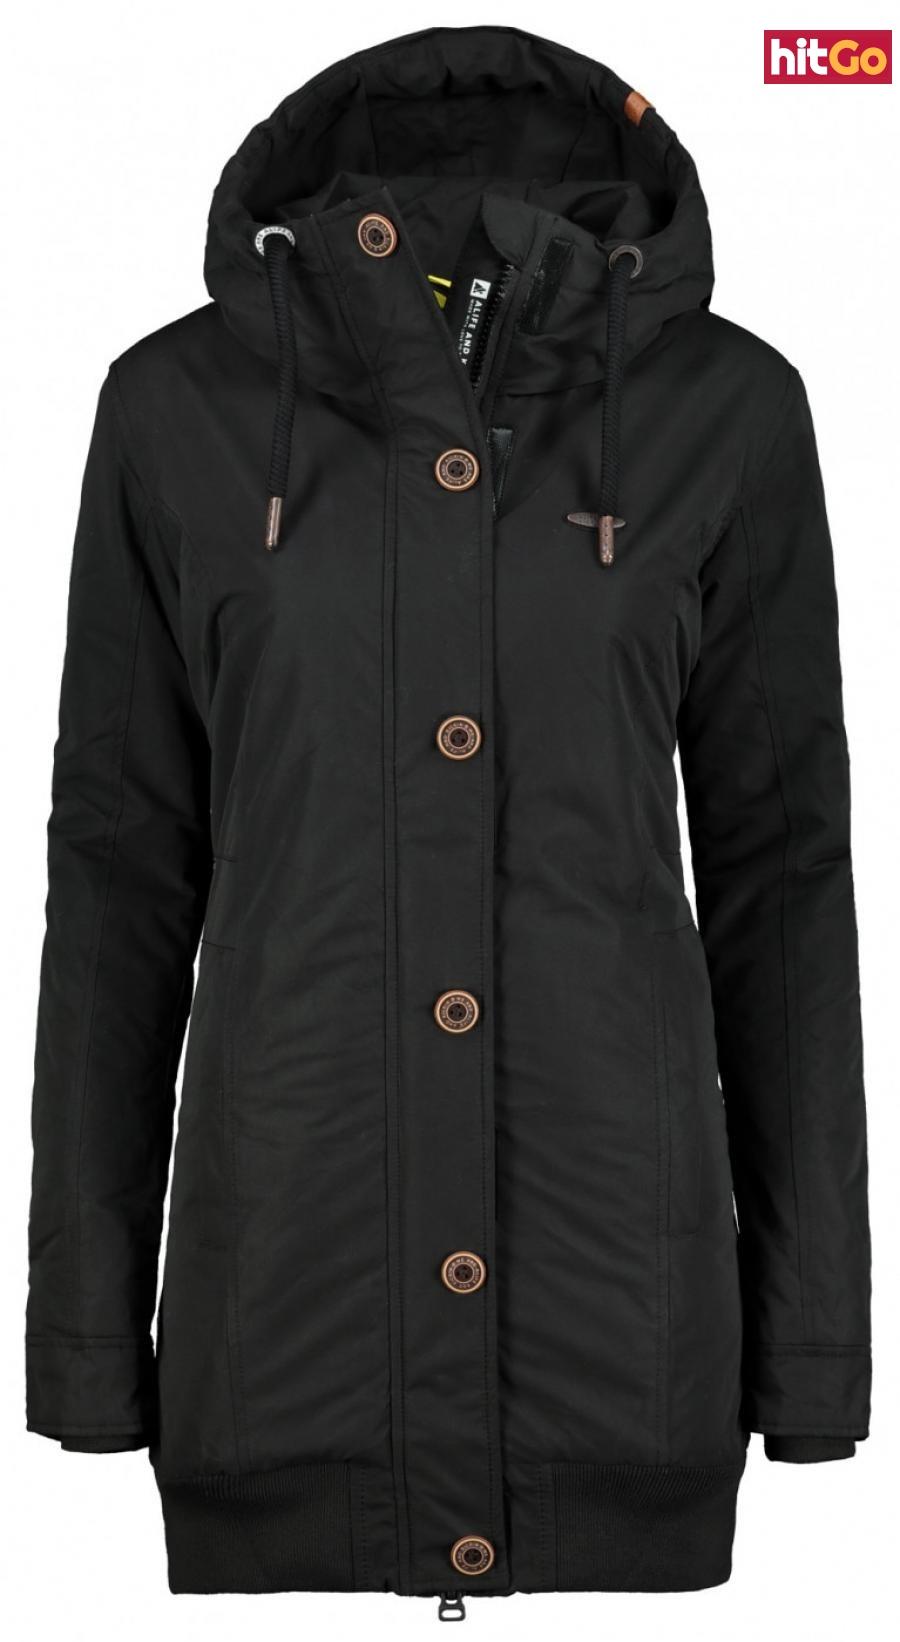 Womens jacket Alife and Kickin Abby dámské Moonless S